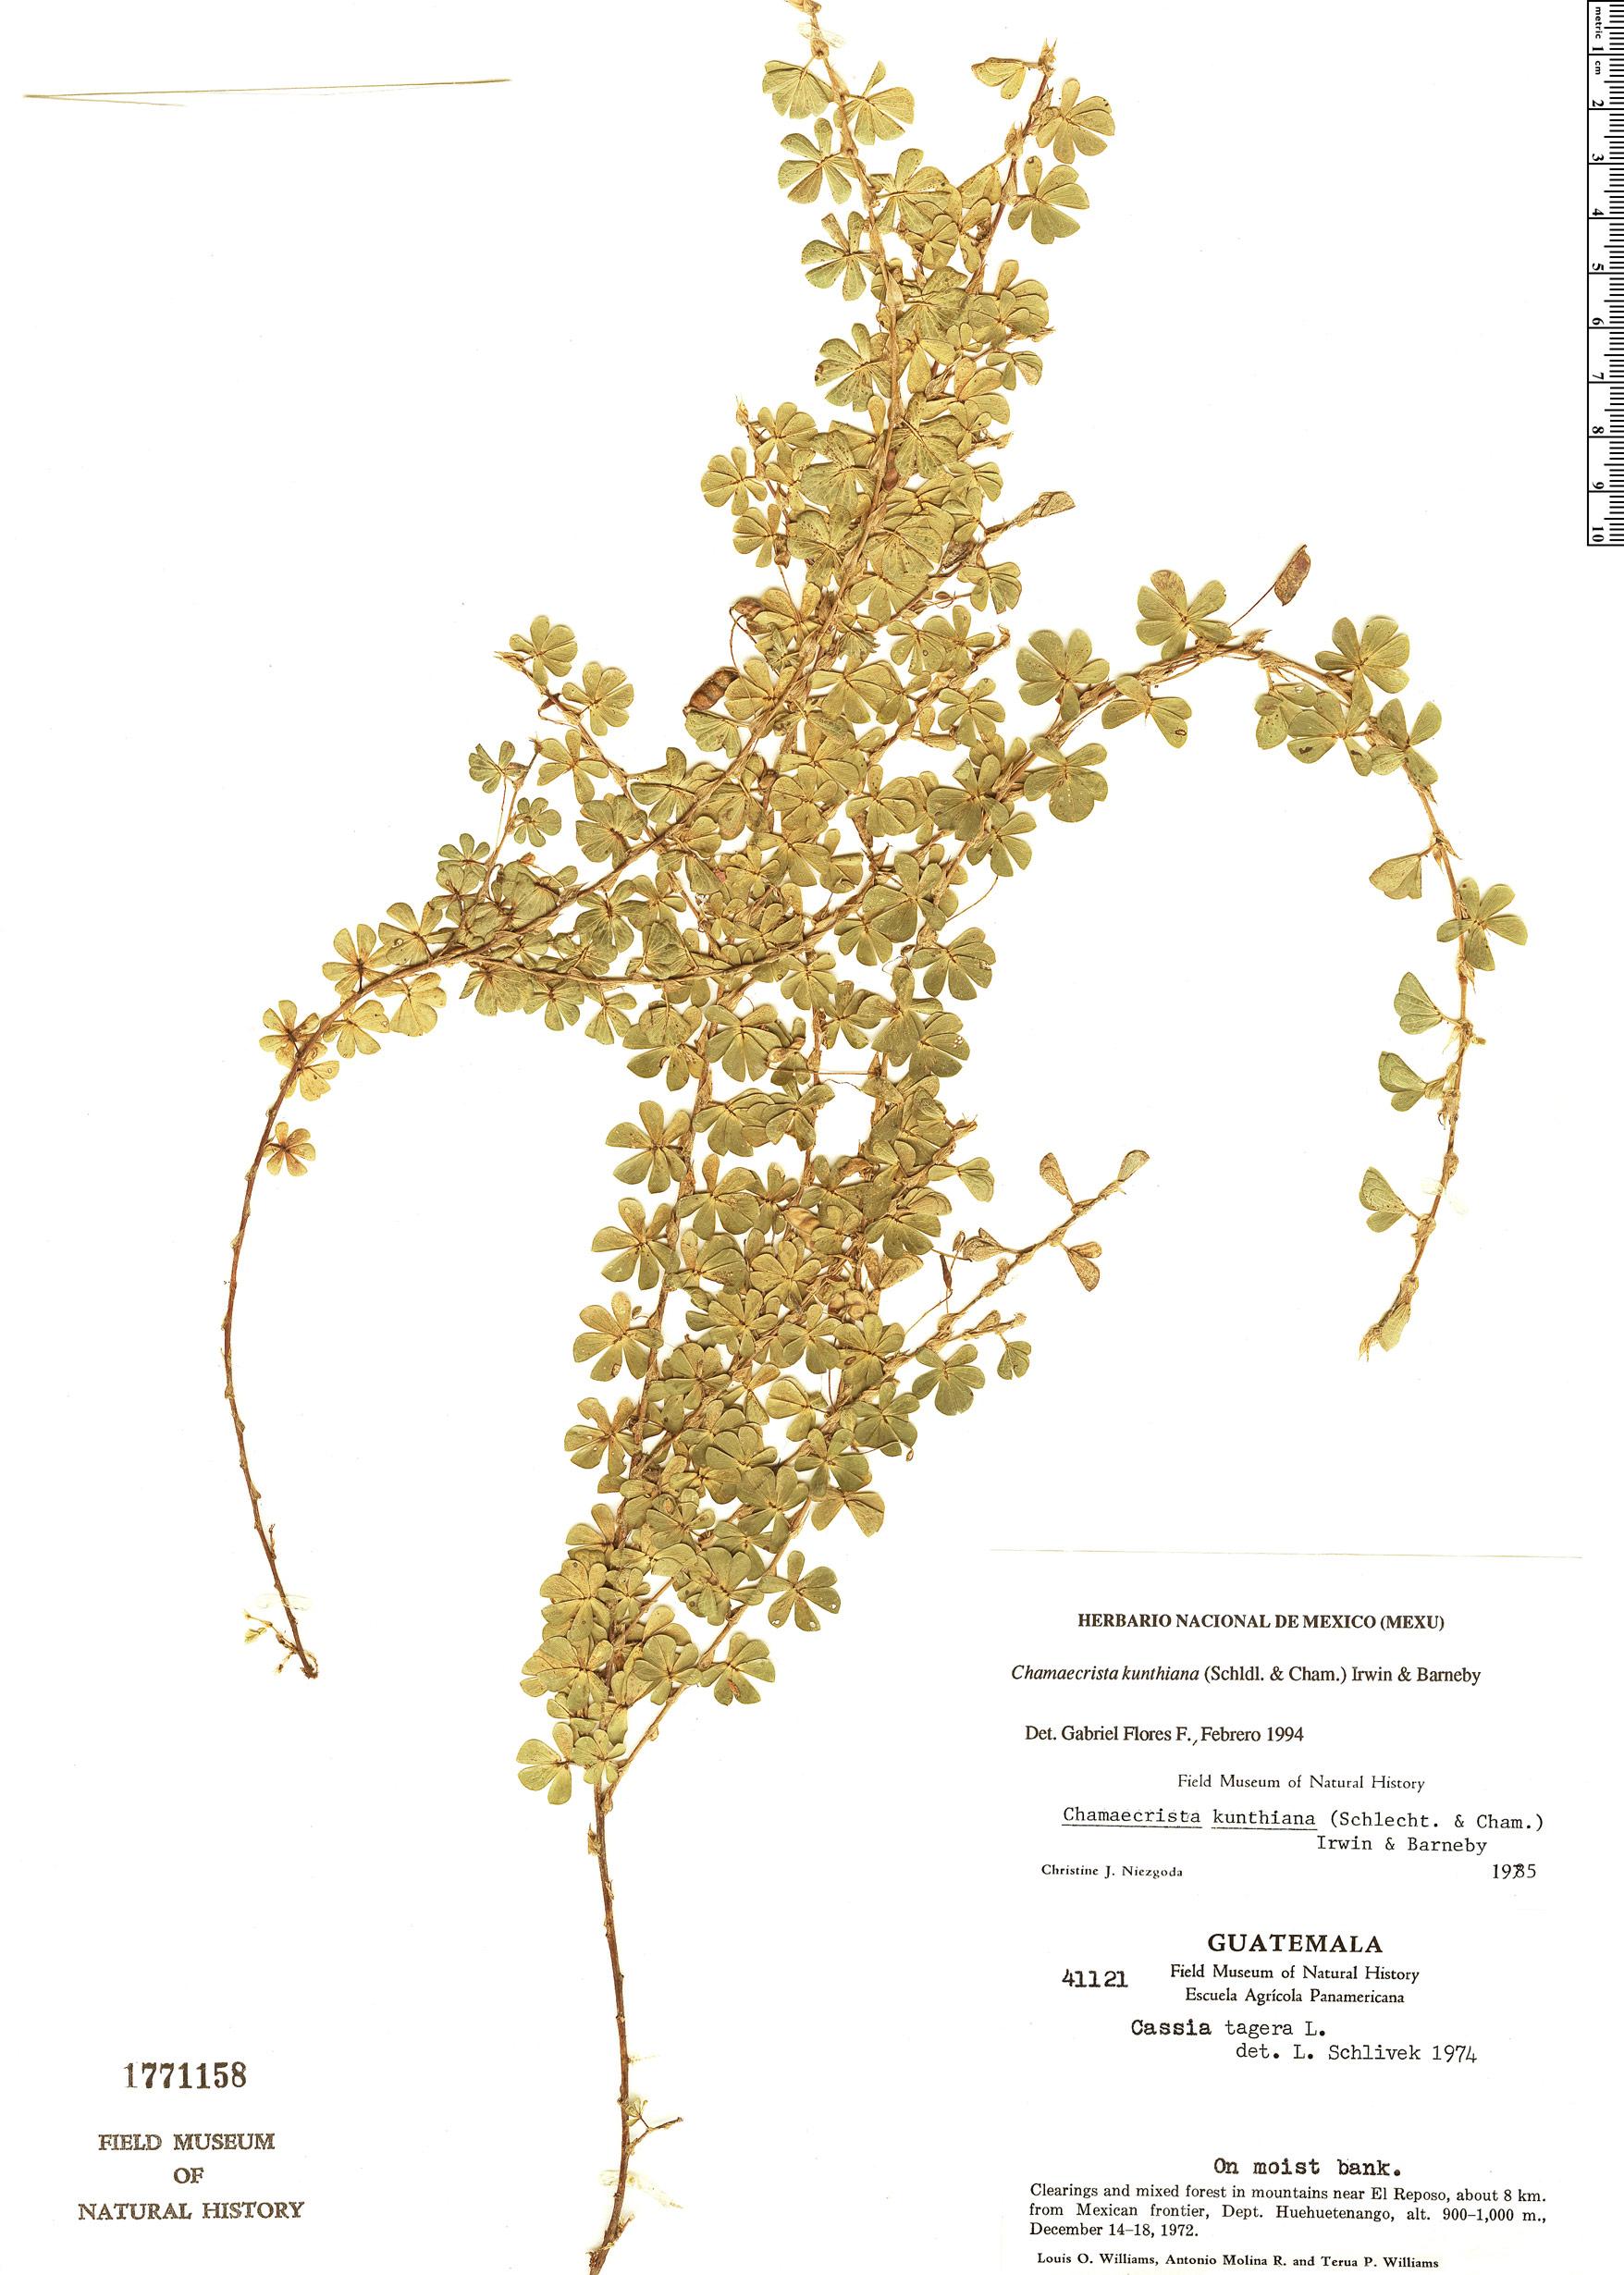 Specimen: Chamaecrista kunthiana